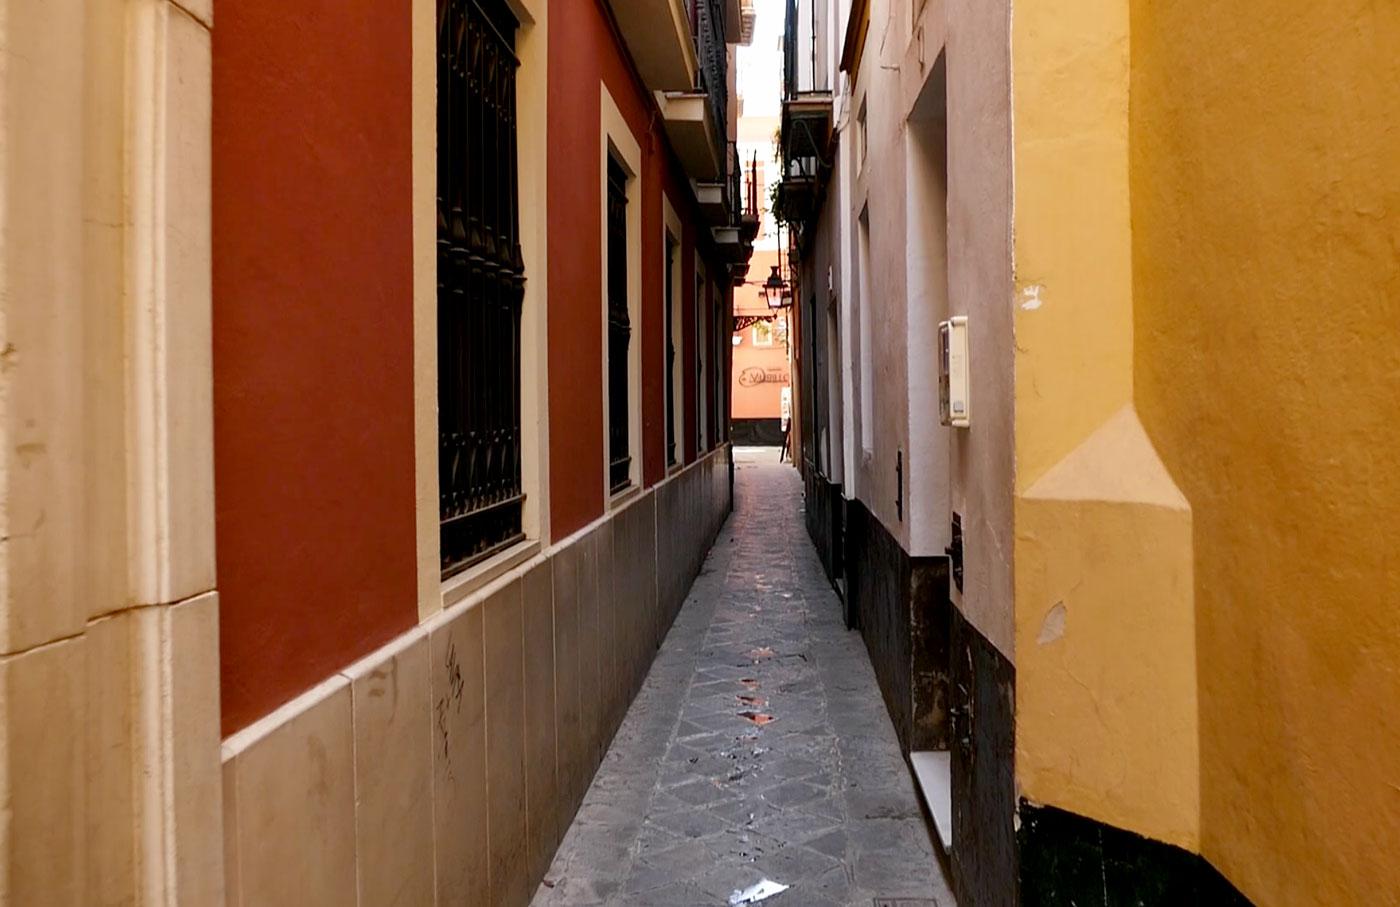 callejon beso calle reinoso